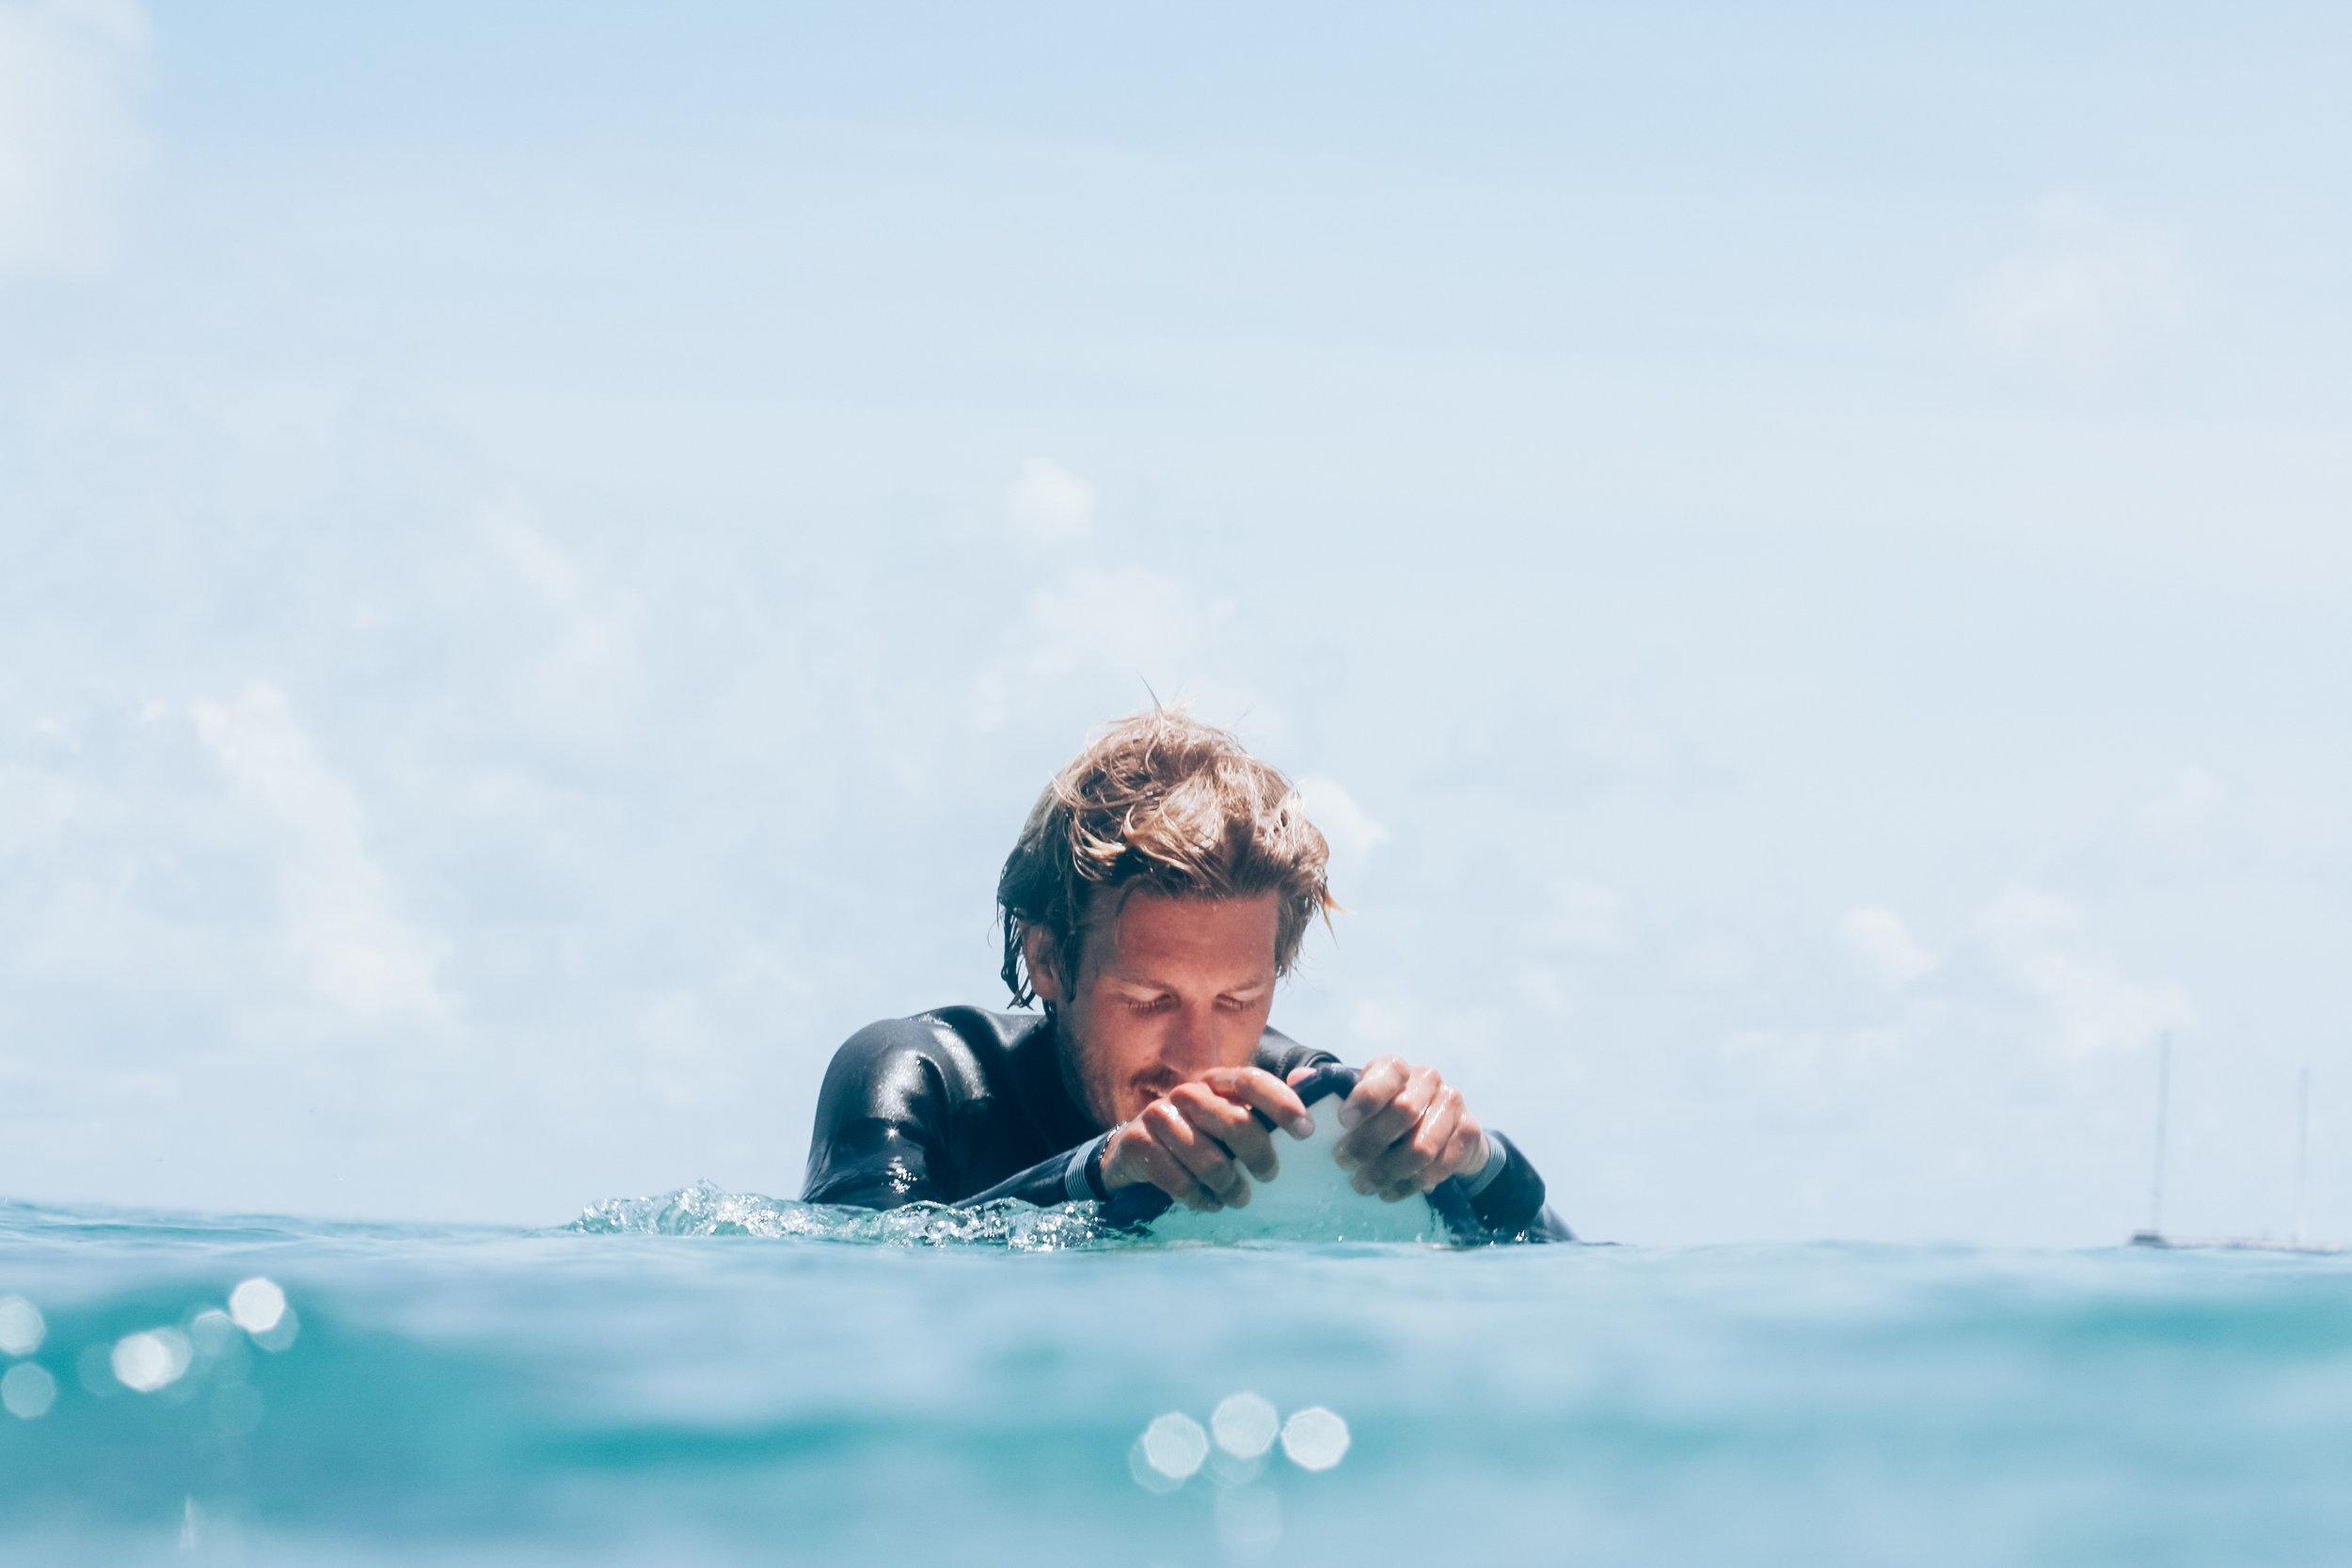 surf_day2-42.jpg